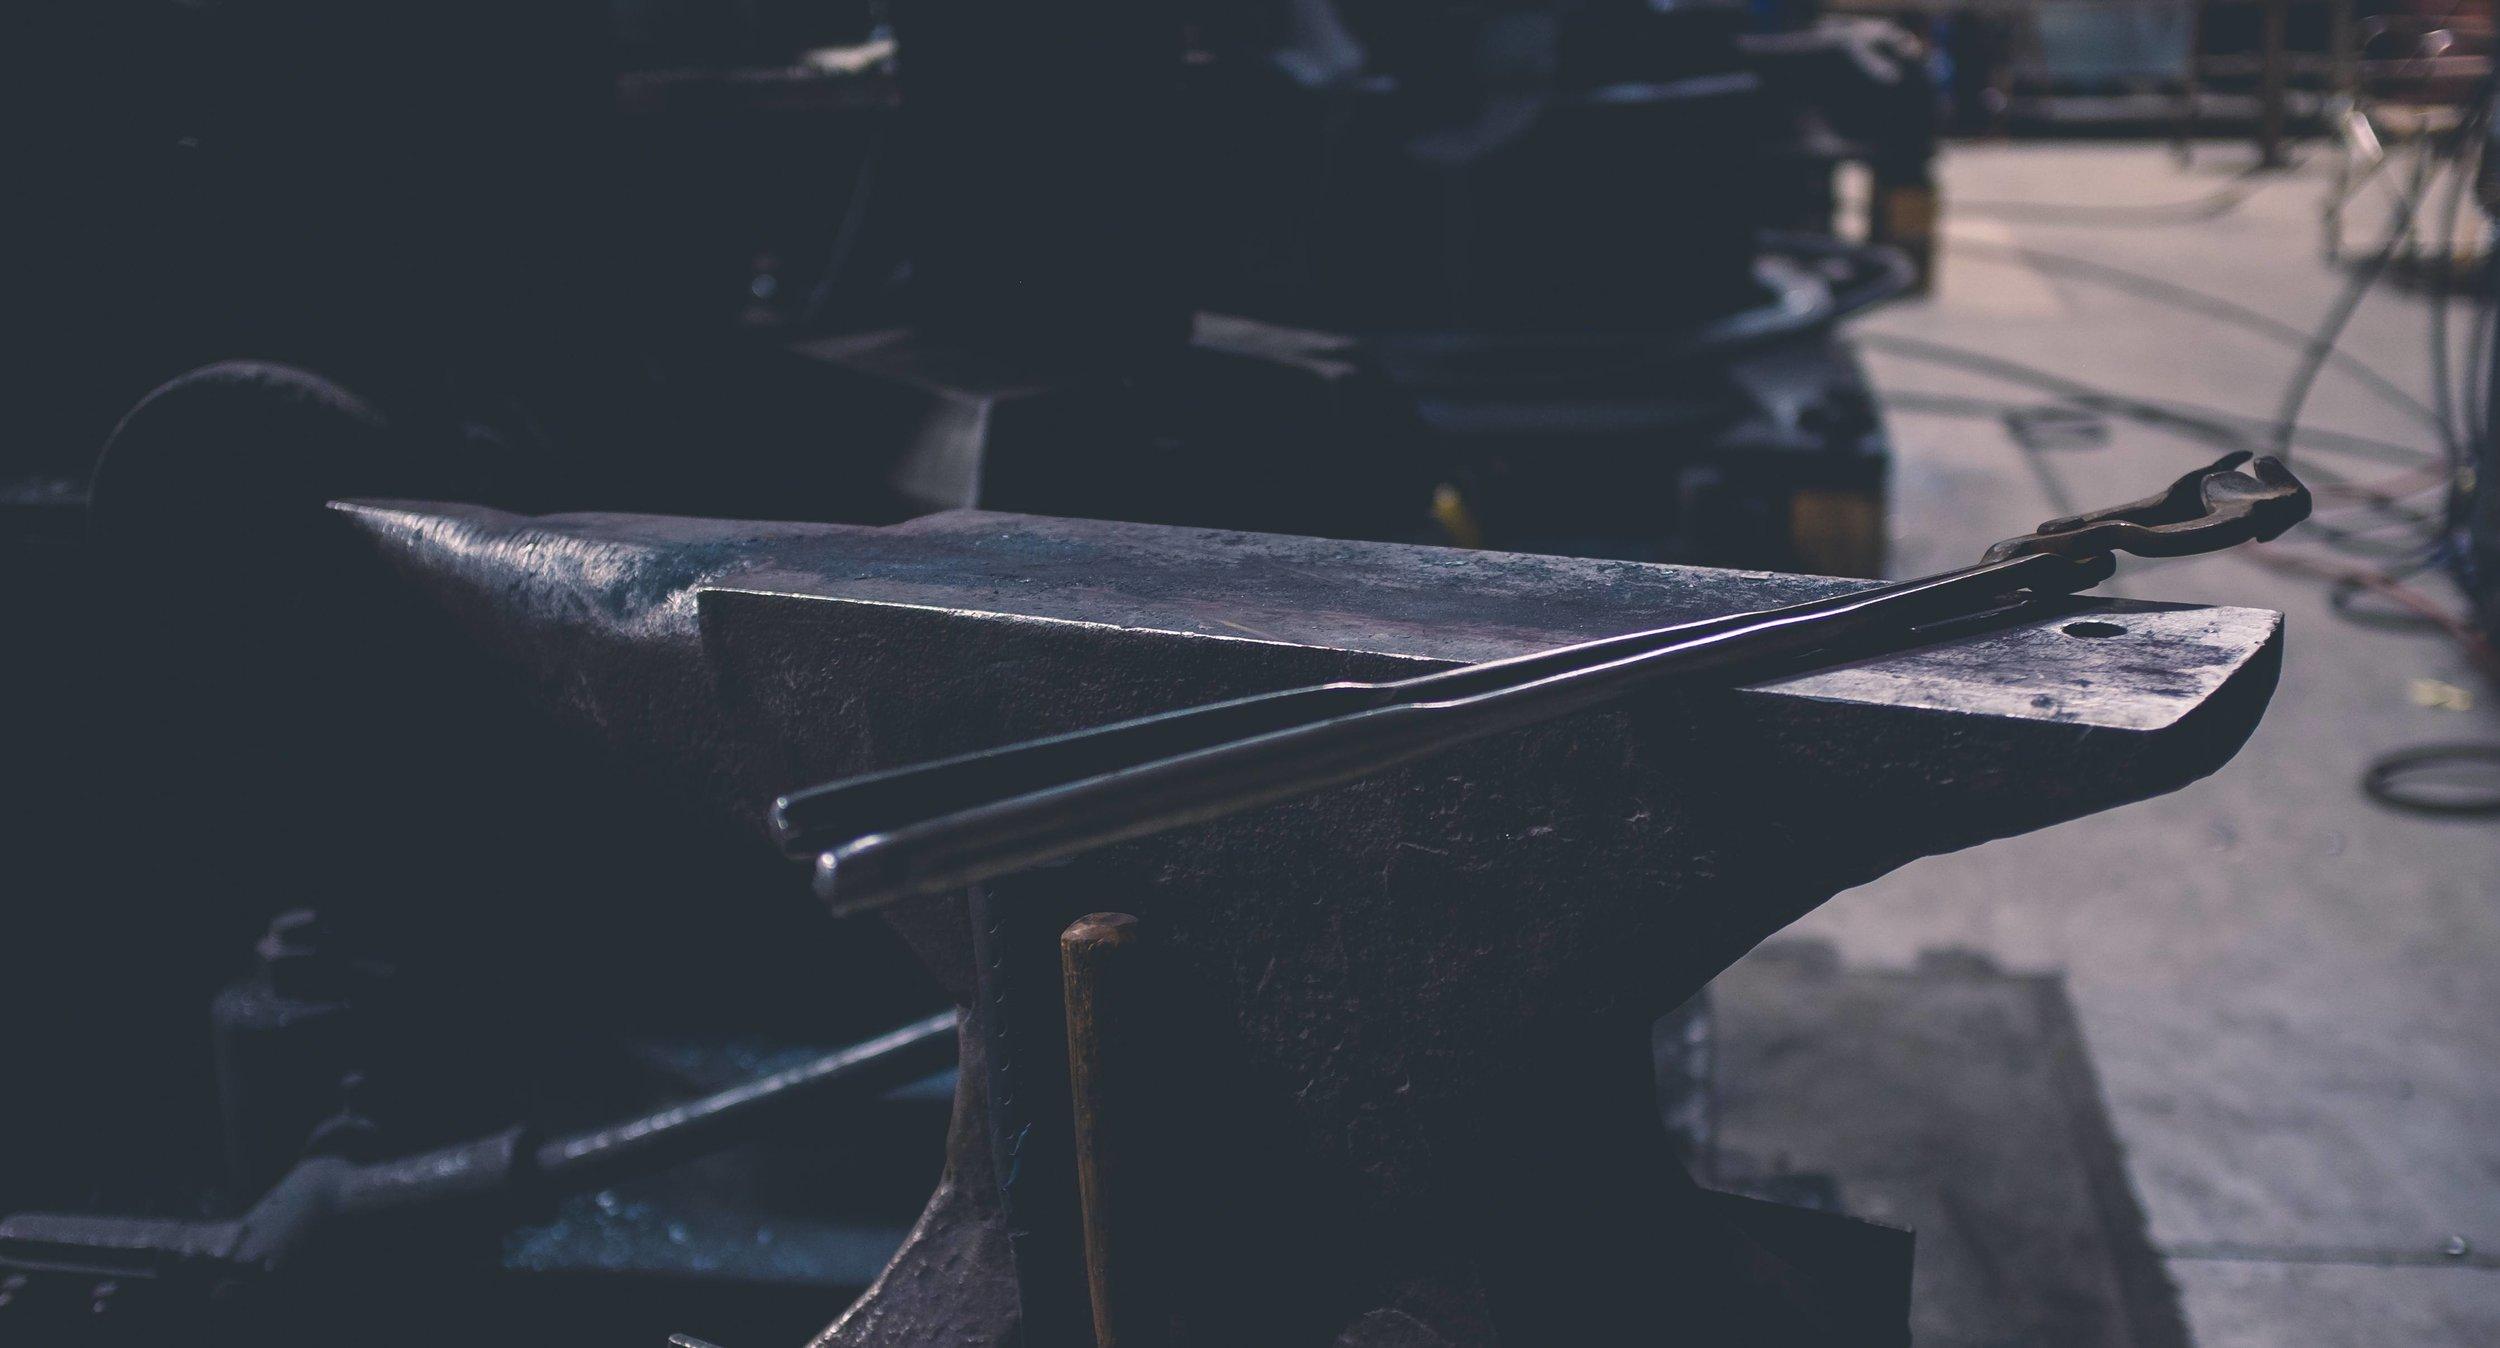 Running Man Forge - Handmade CutleryMade in the usa